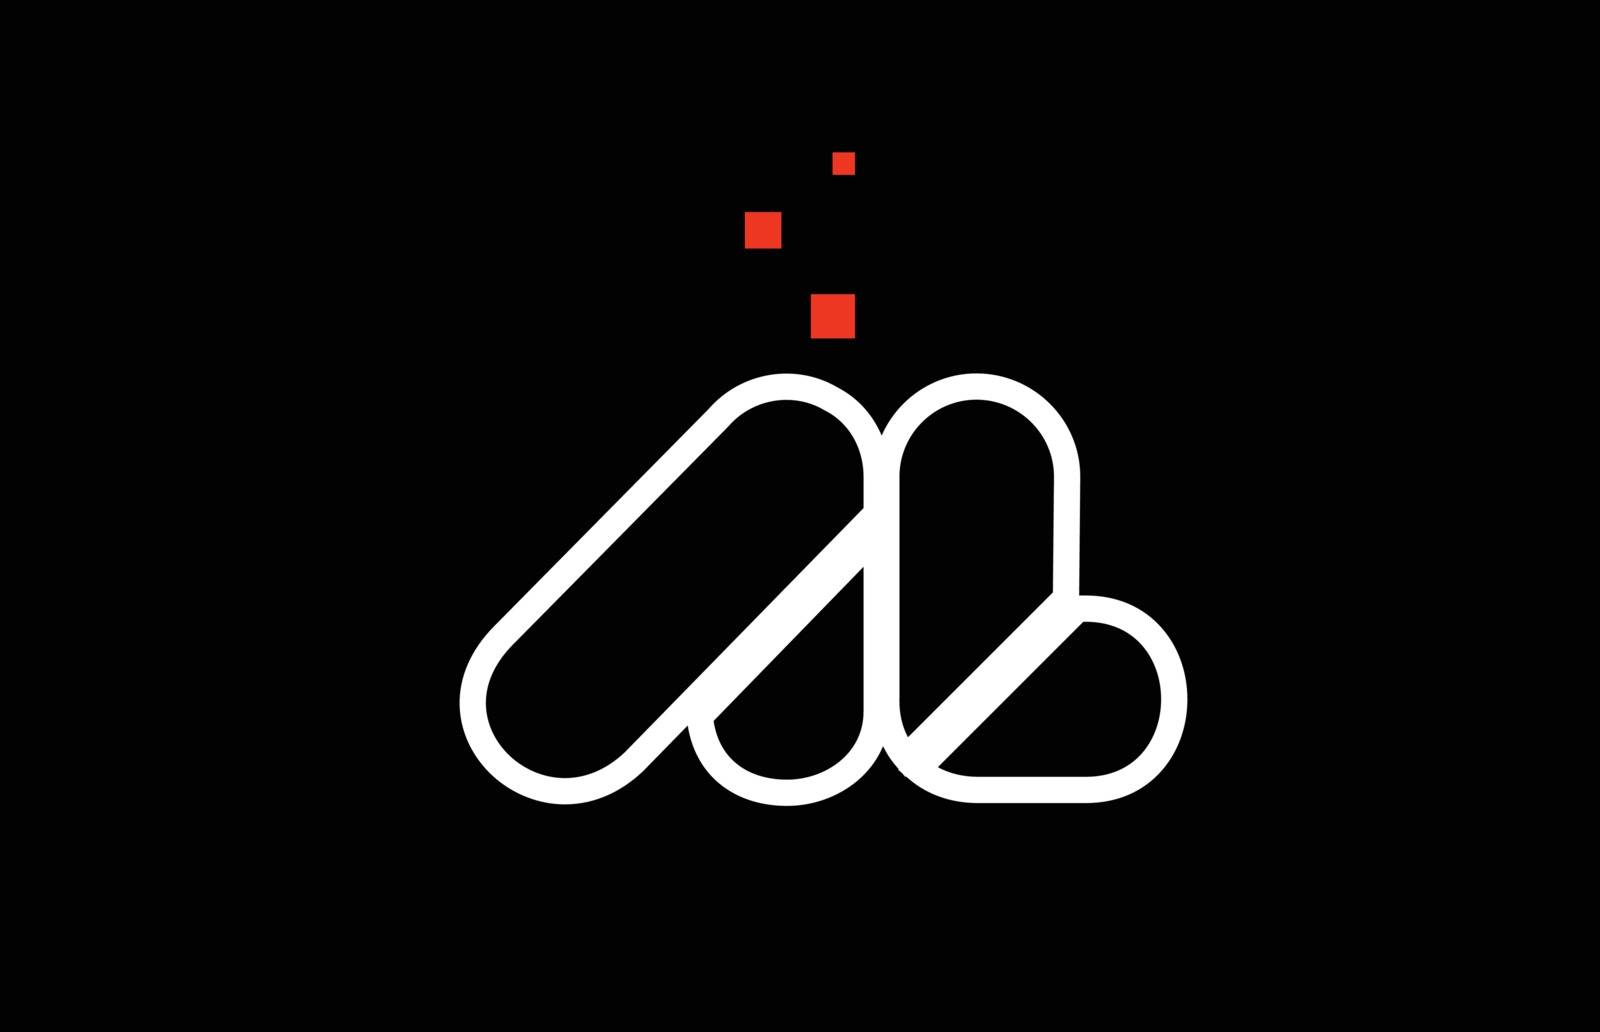 AL A L black white red alphabet letter combination logo icon des by dragomirescu